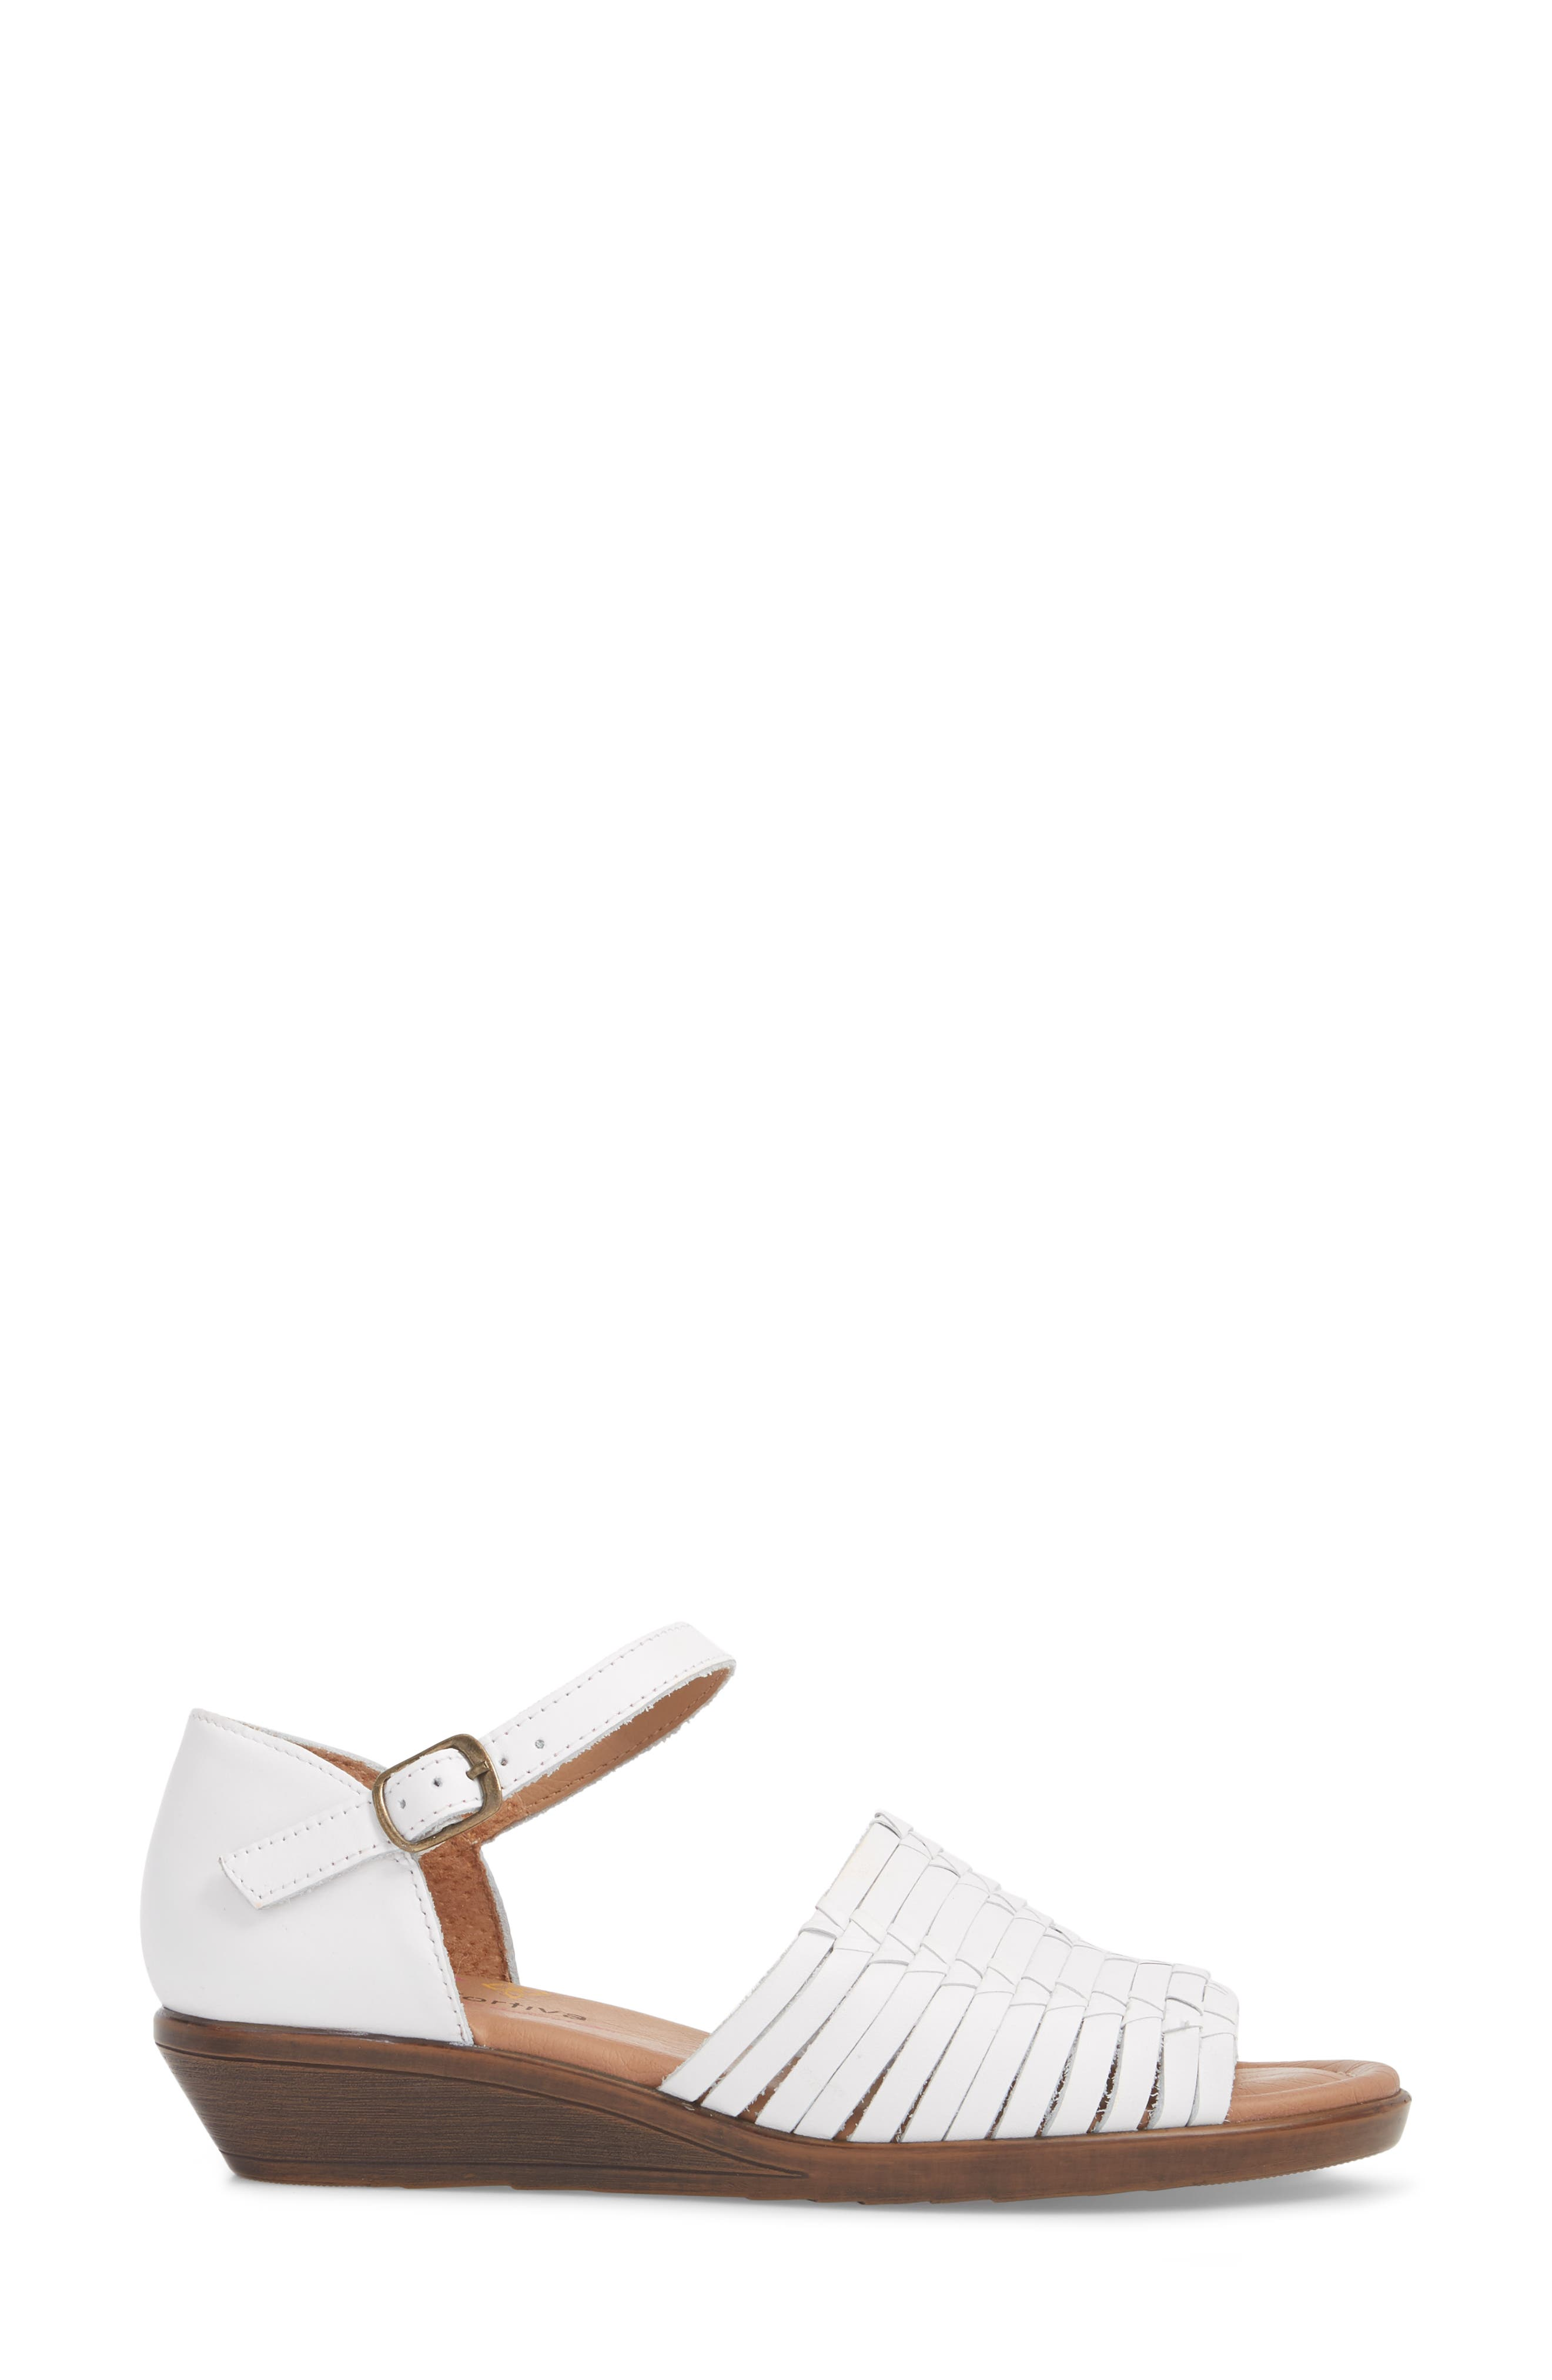 Fayann Sandal,                             Alternate thumbnail 3, color,                             White Leather